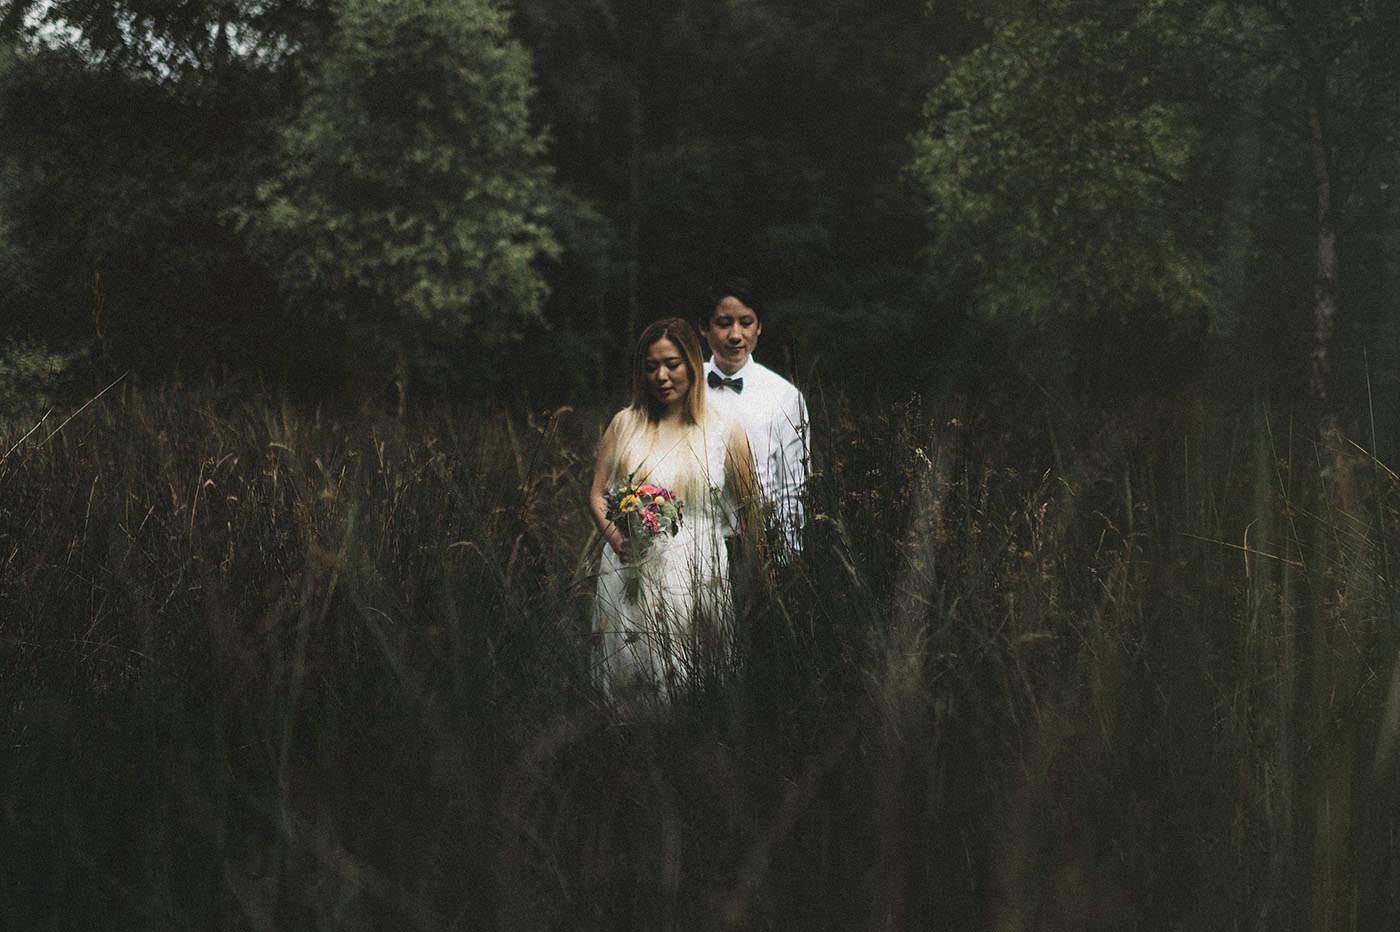 wicklow_wedding_photography018.jpg